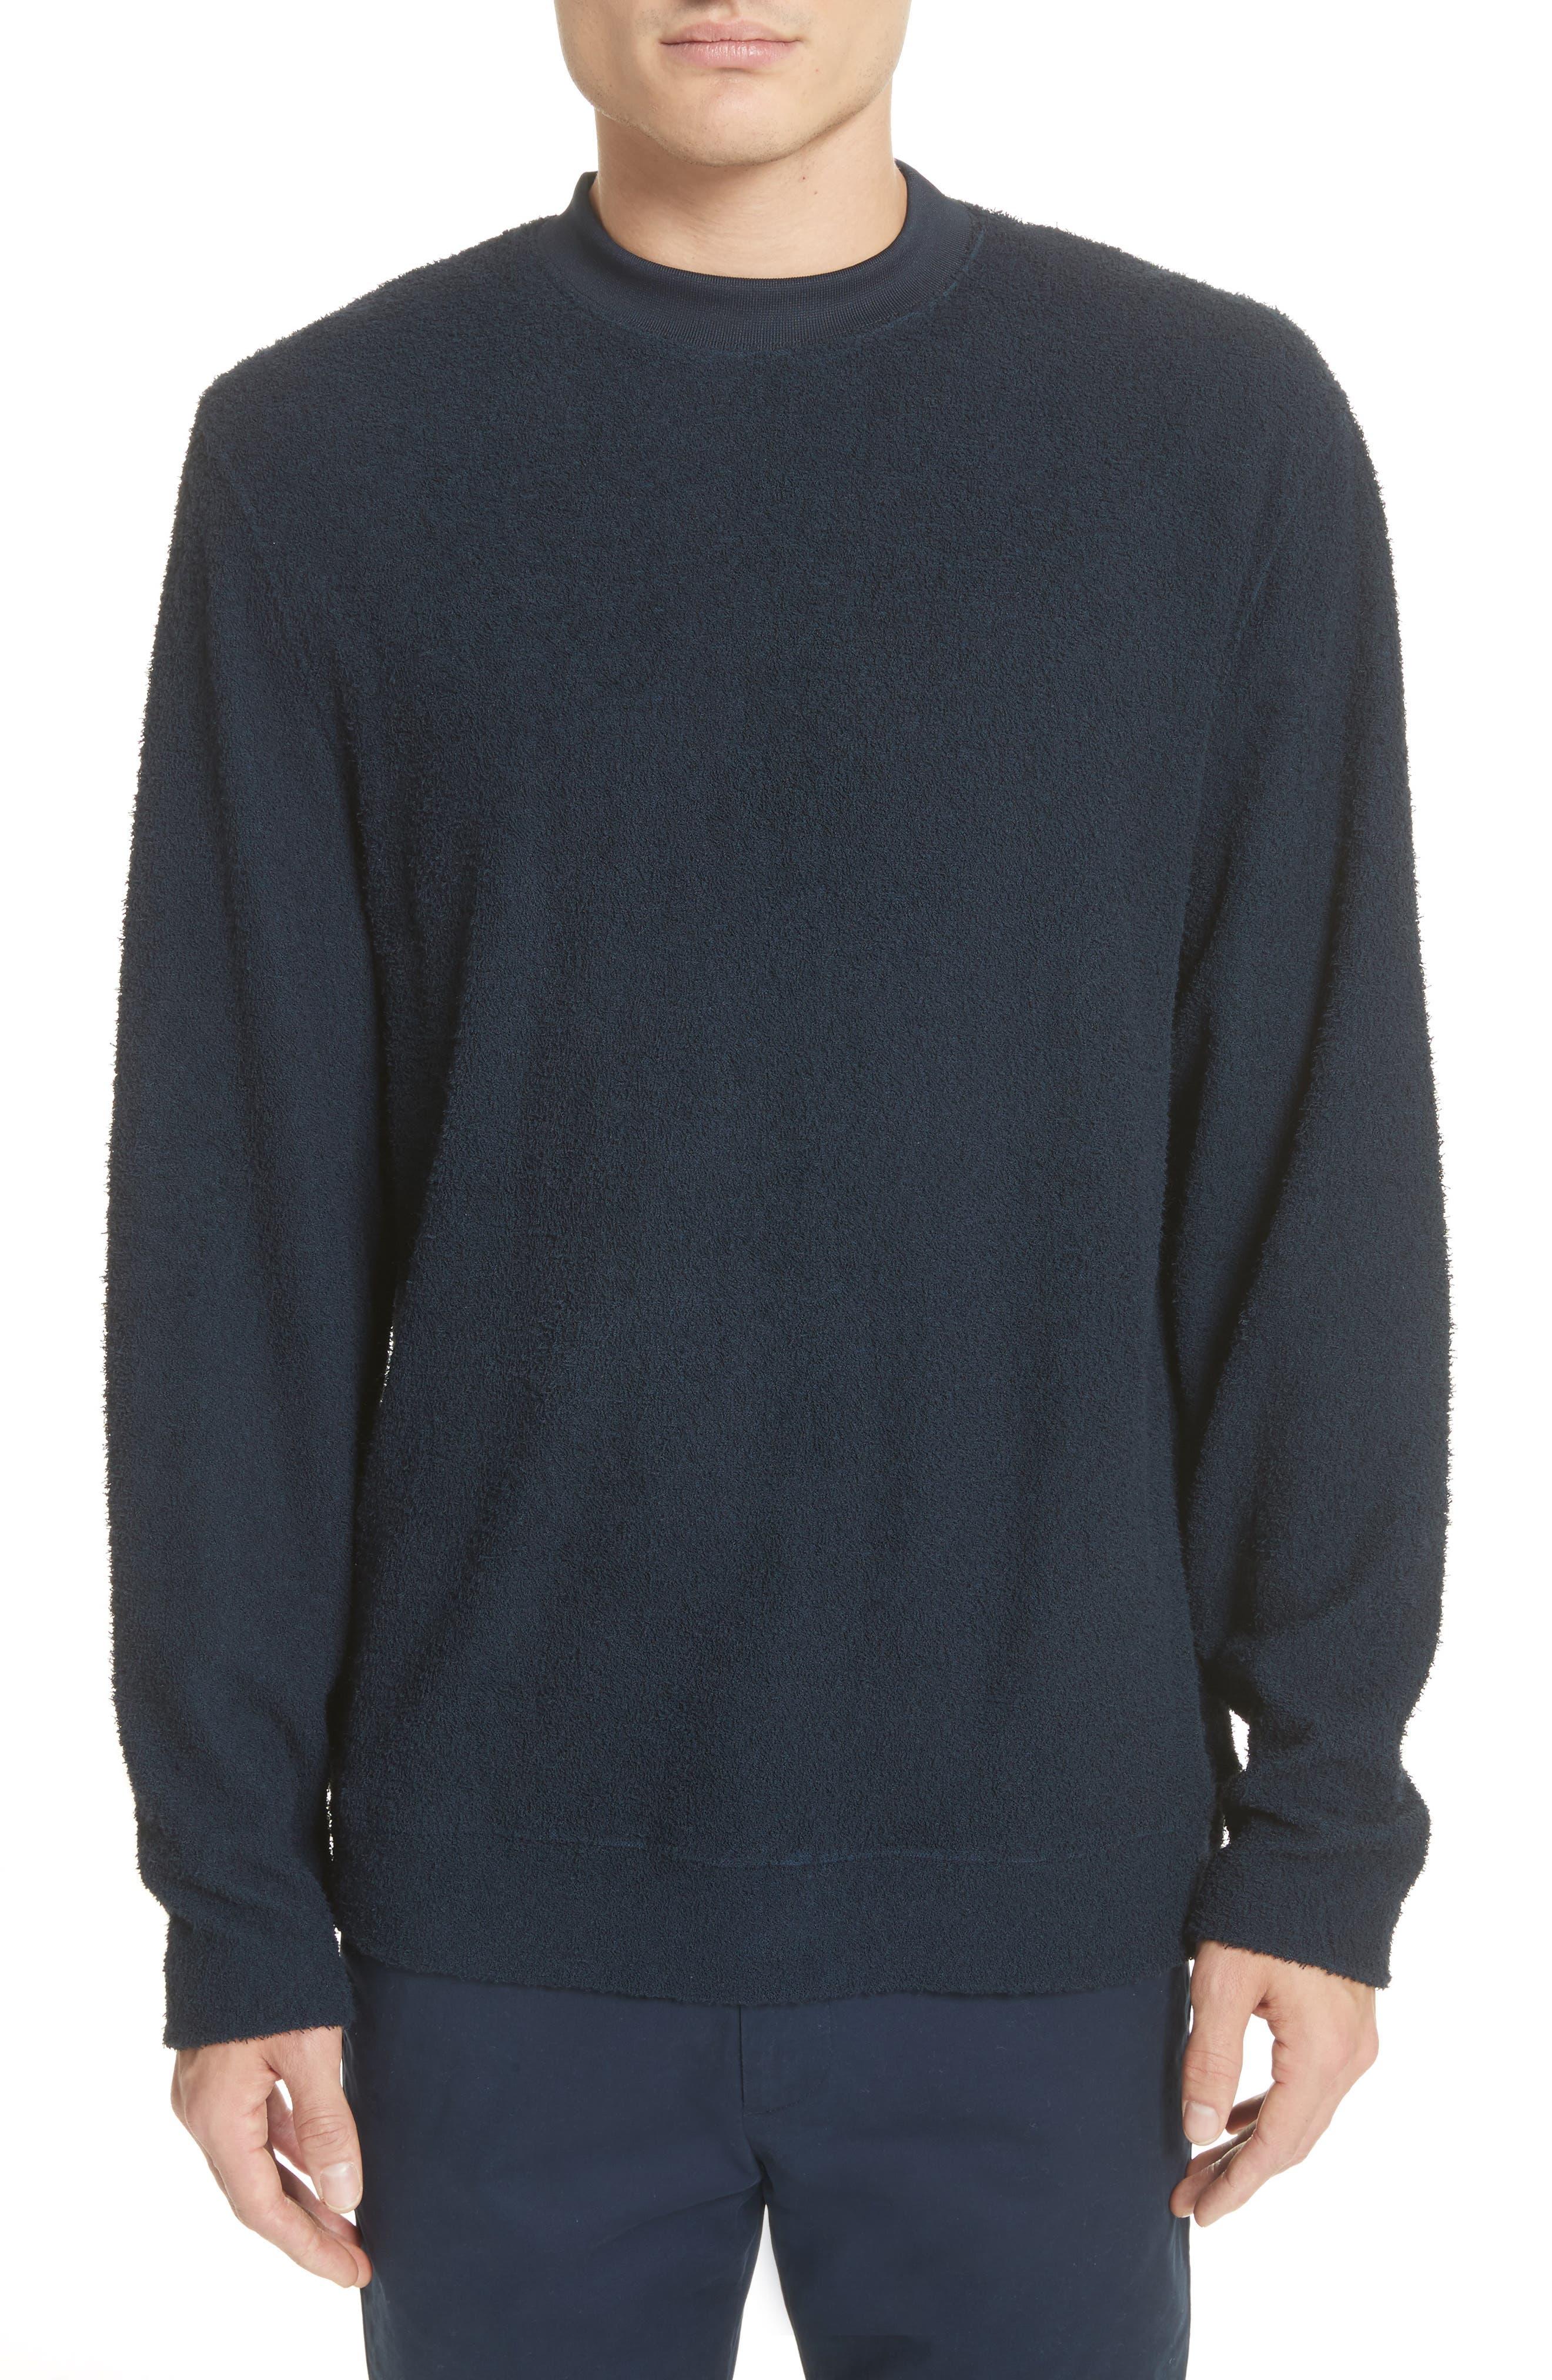 Rask Crewneck Sweatshirt,                         Main,                         color, Dark Navy